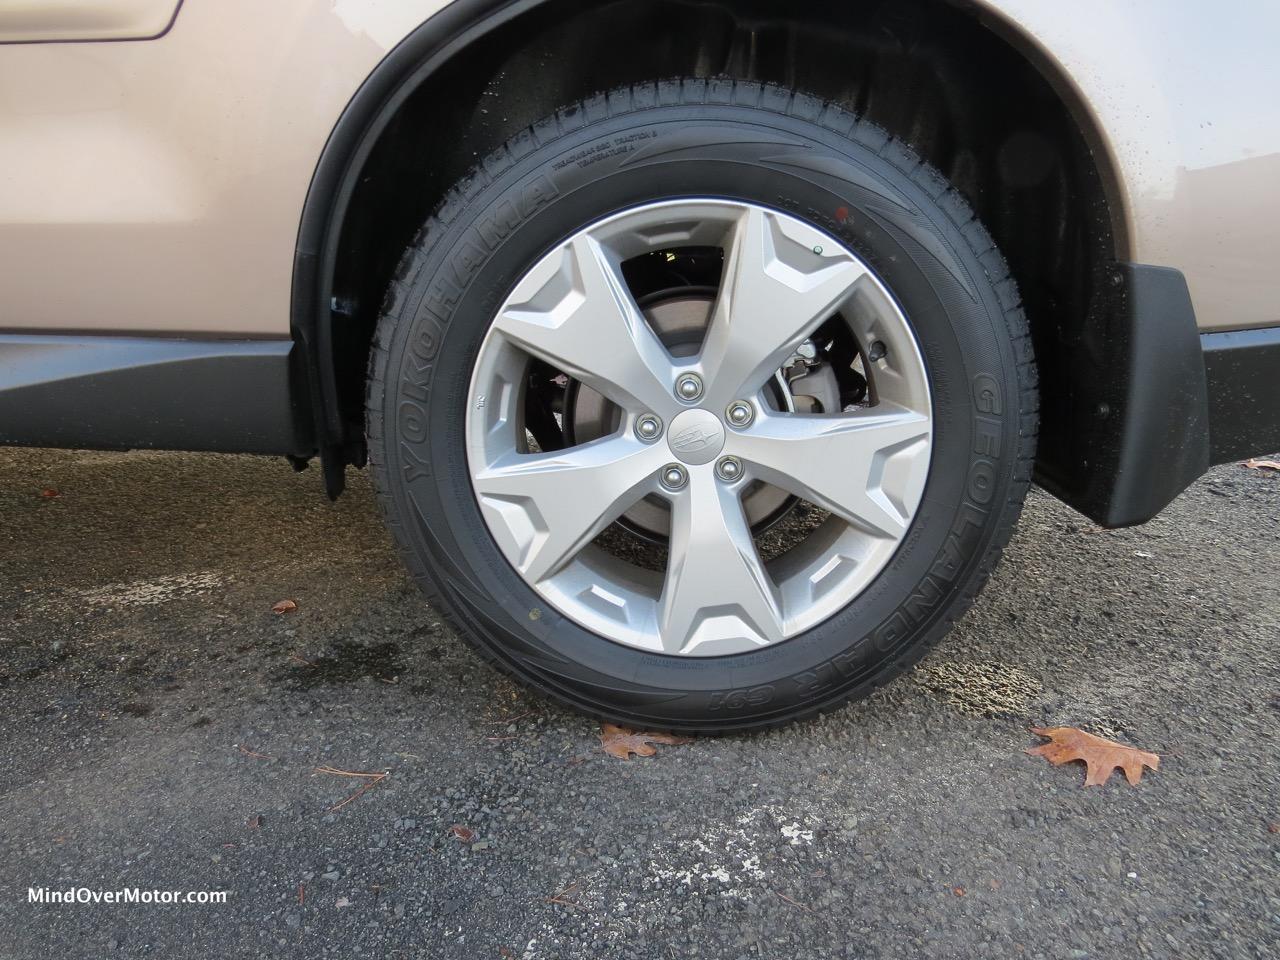 2015 Subaru Forester Wheel